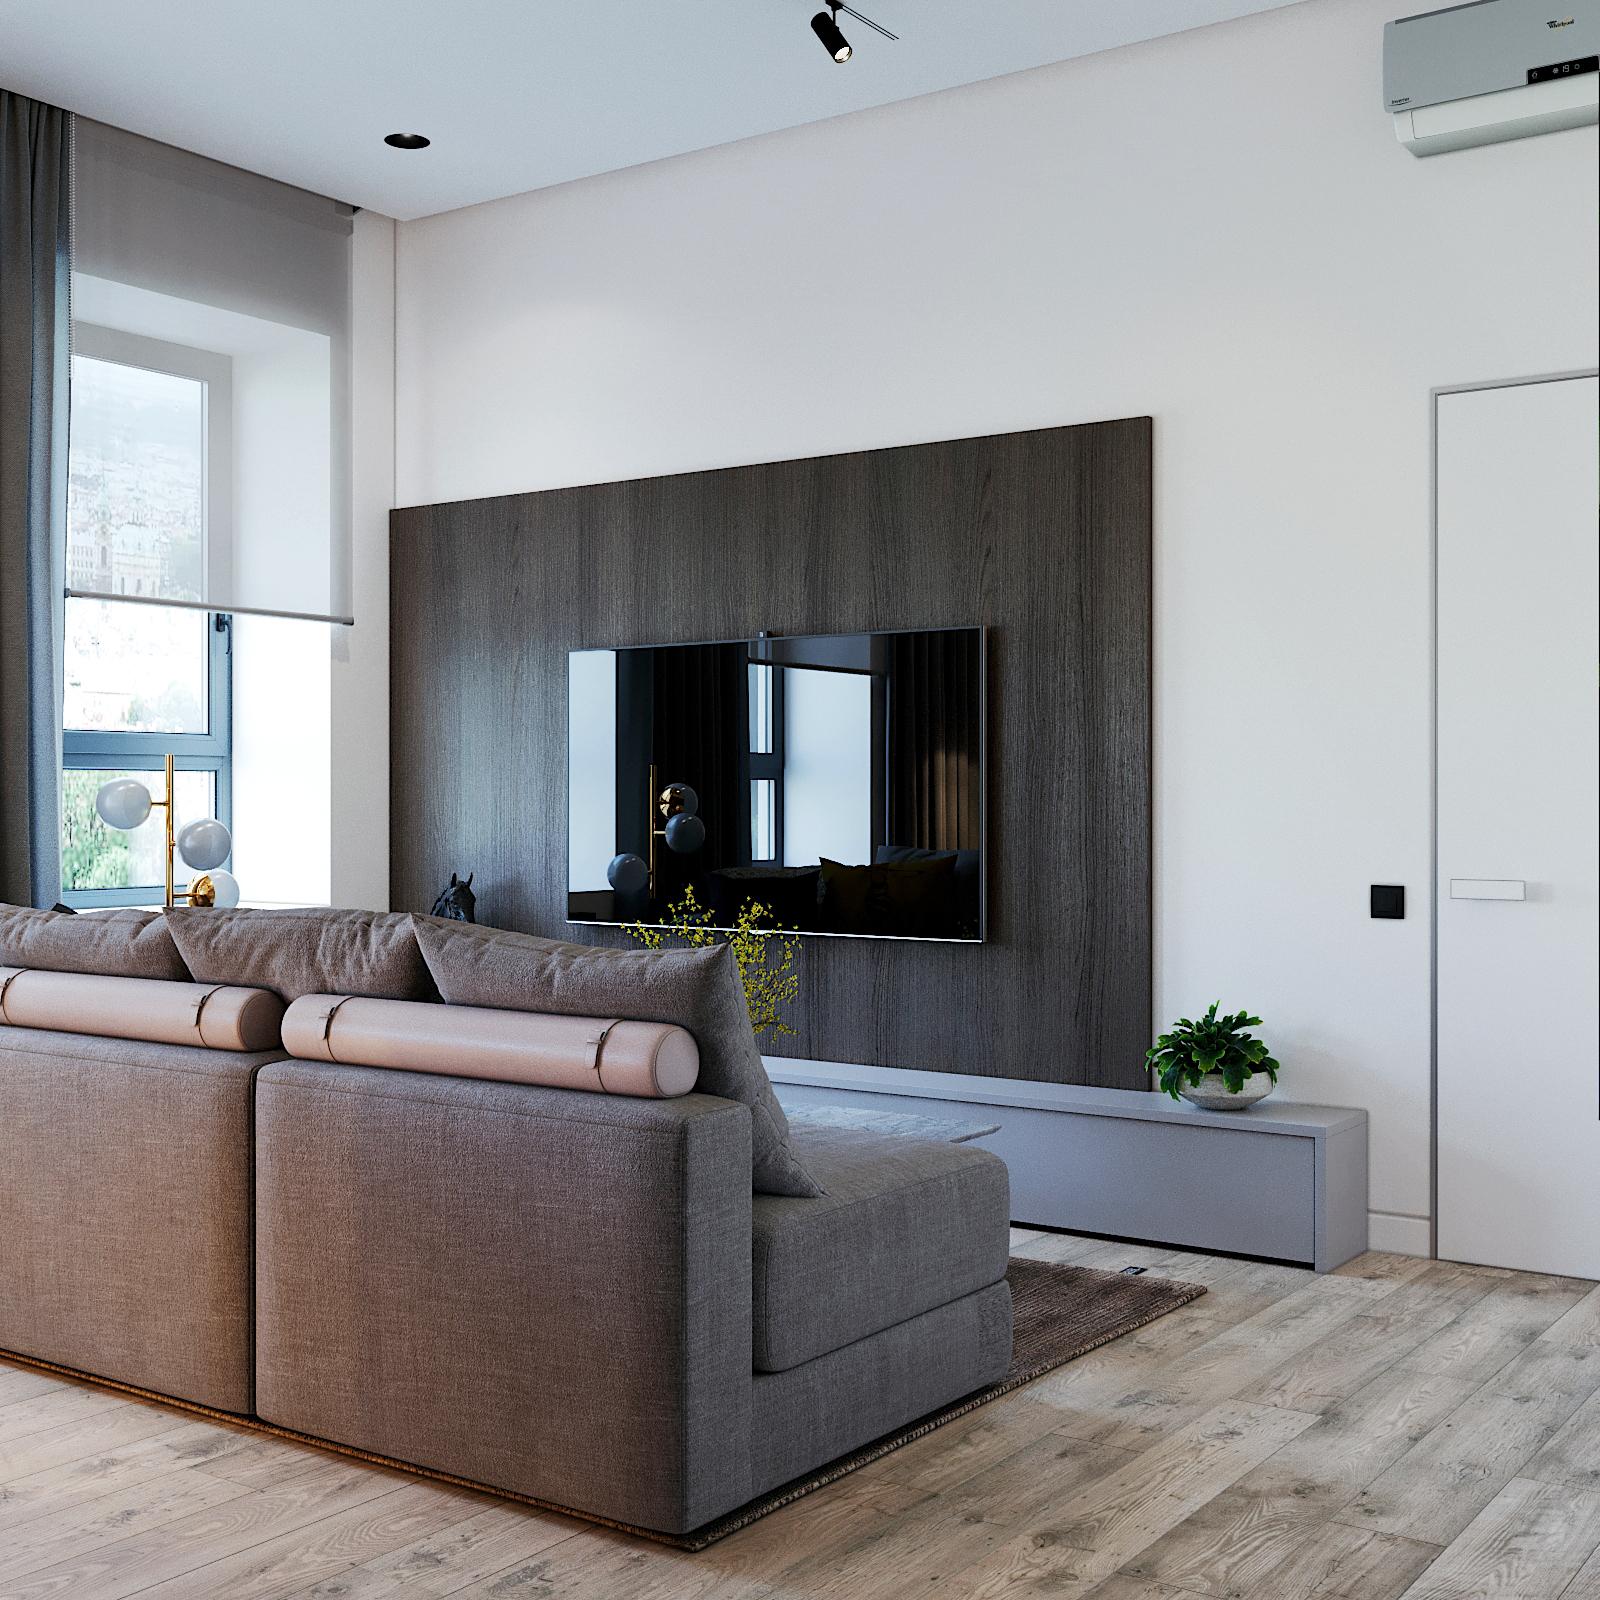 https://avantum-remont.ru/wp-content/uploads/2015/05/Livingroom-Kitchen_Interactive-LightMix_View03.jpg